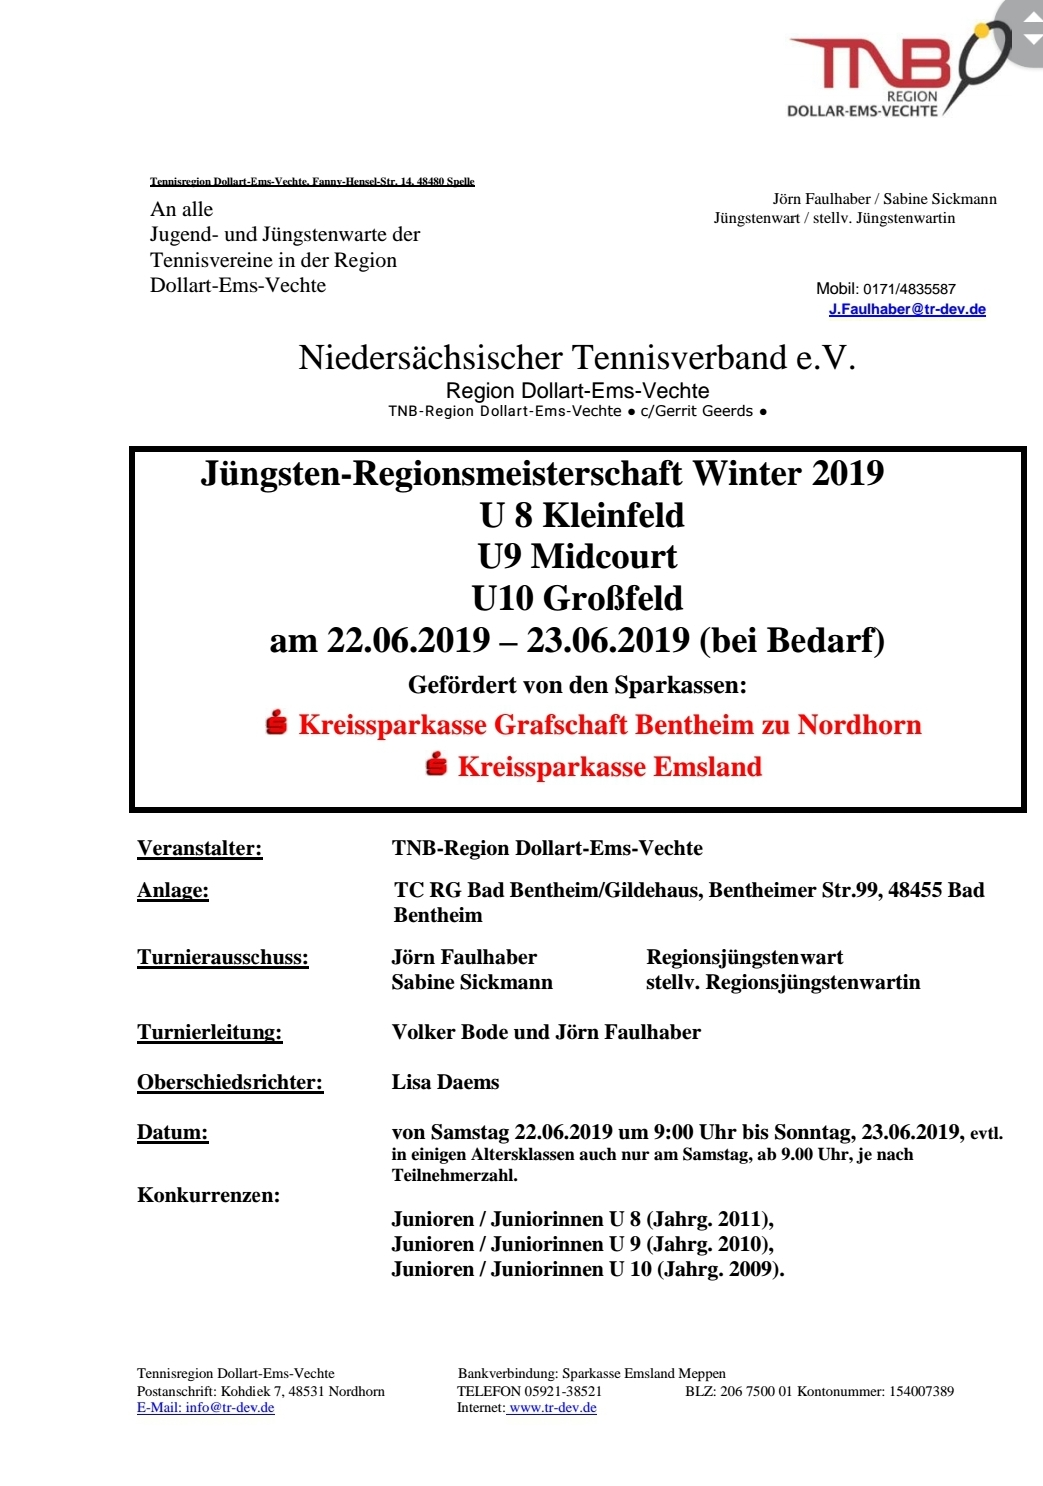 Jüngsten-Regionsmeisterschaften Sommer 2019 U8-U10 Region Dollart-Ems-Vechte